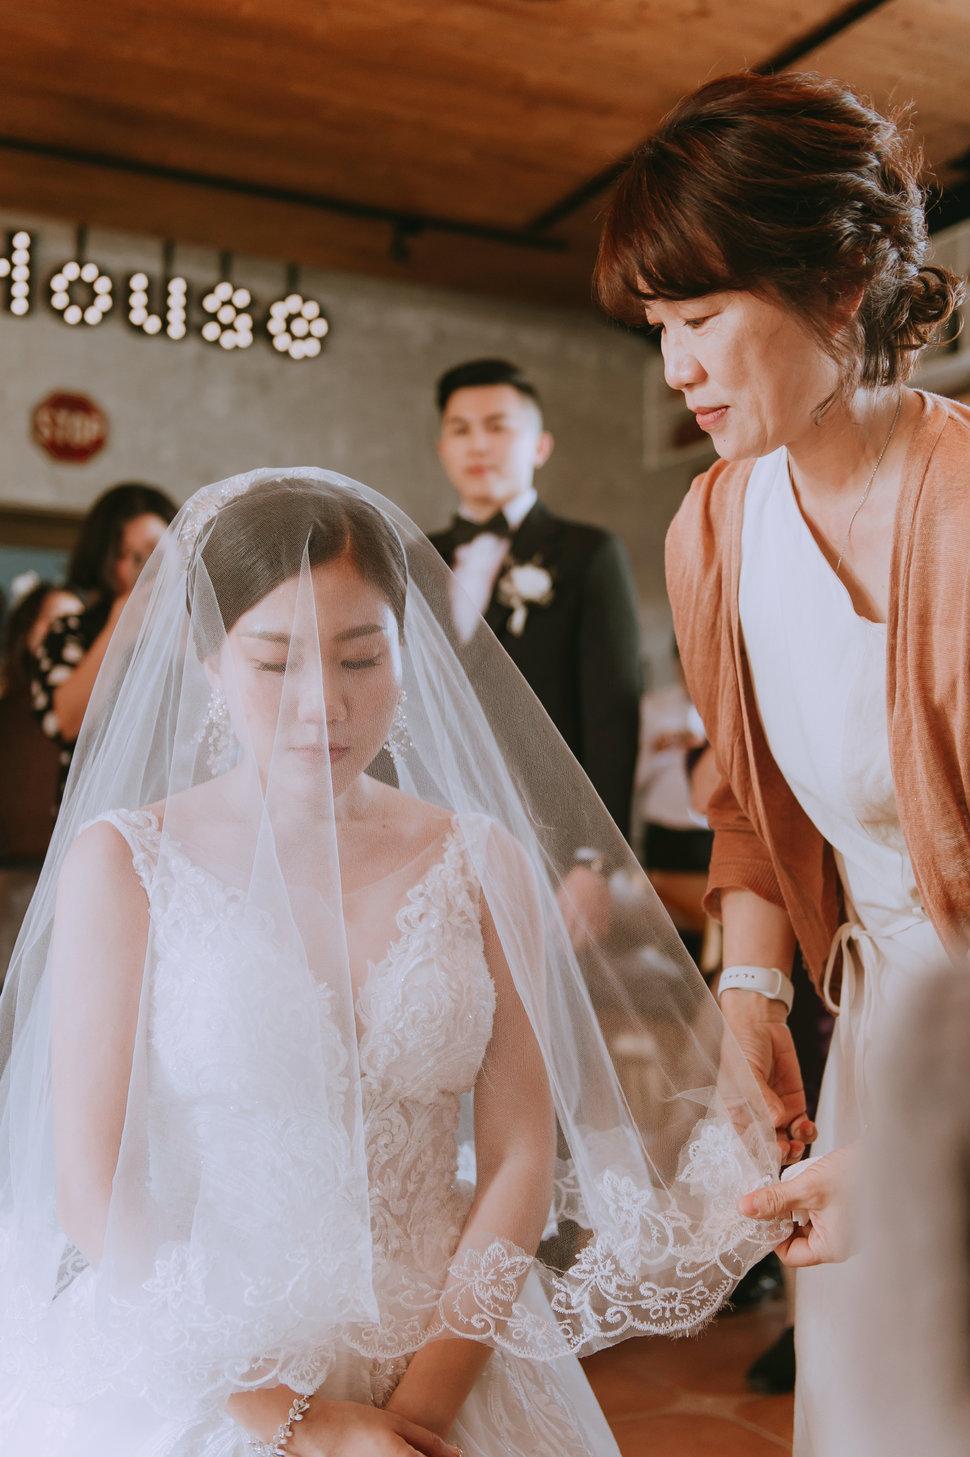 fb1218-14 - 許仙 XuXian攝影工作室《結婚吧》